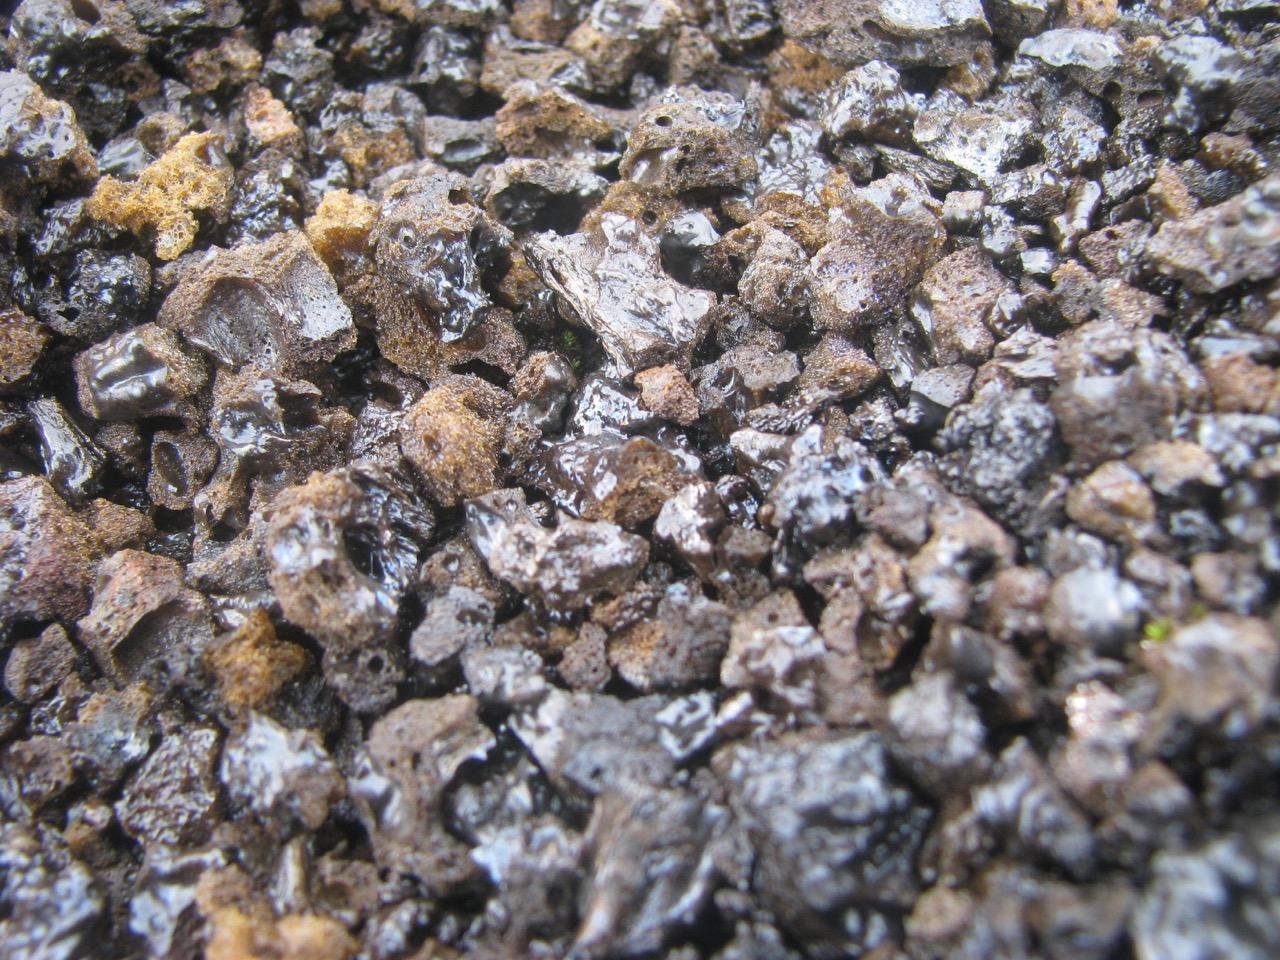 Basalt cinder